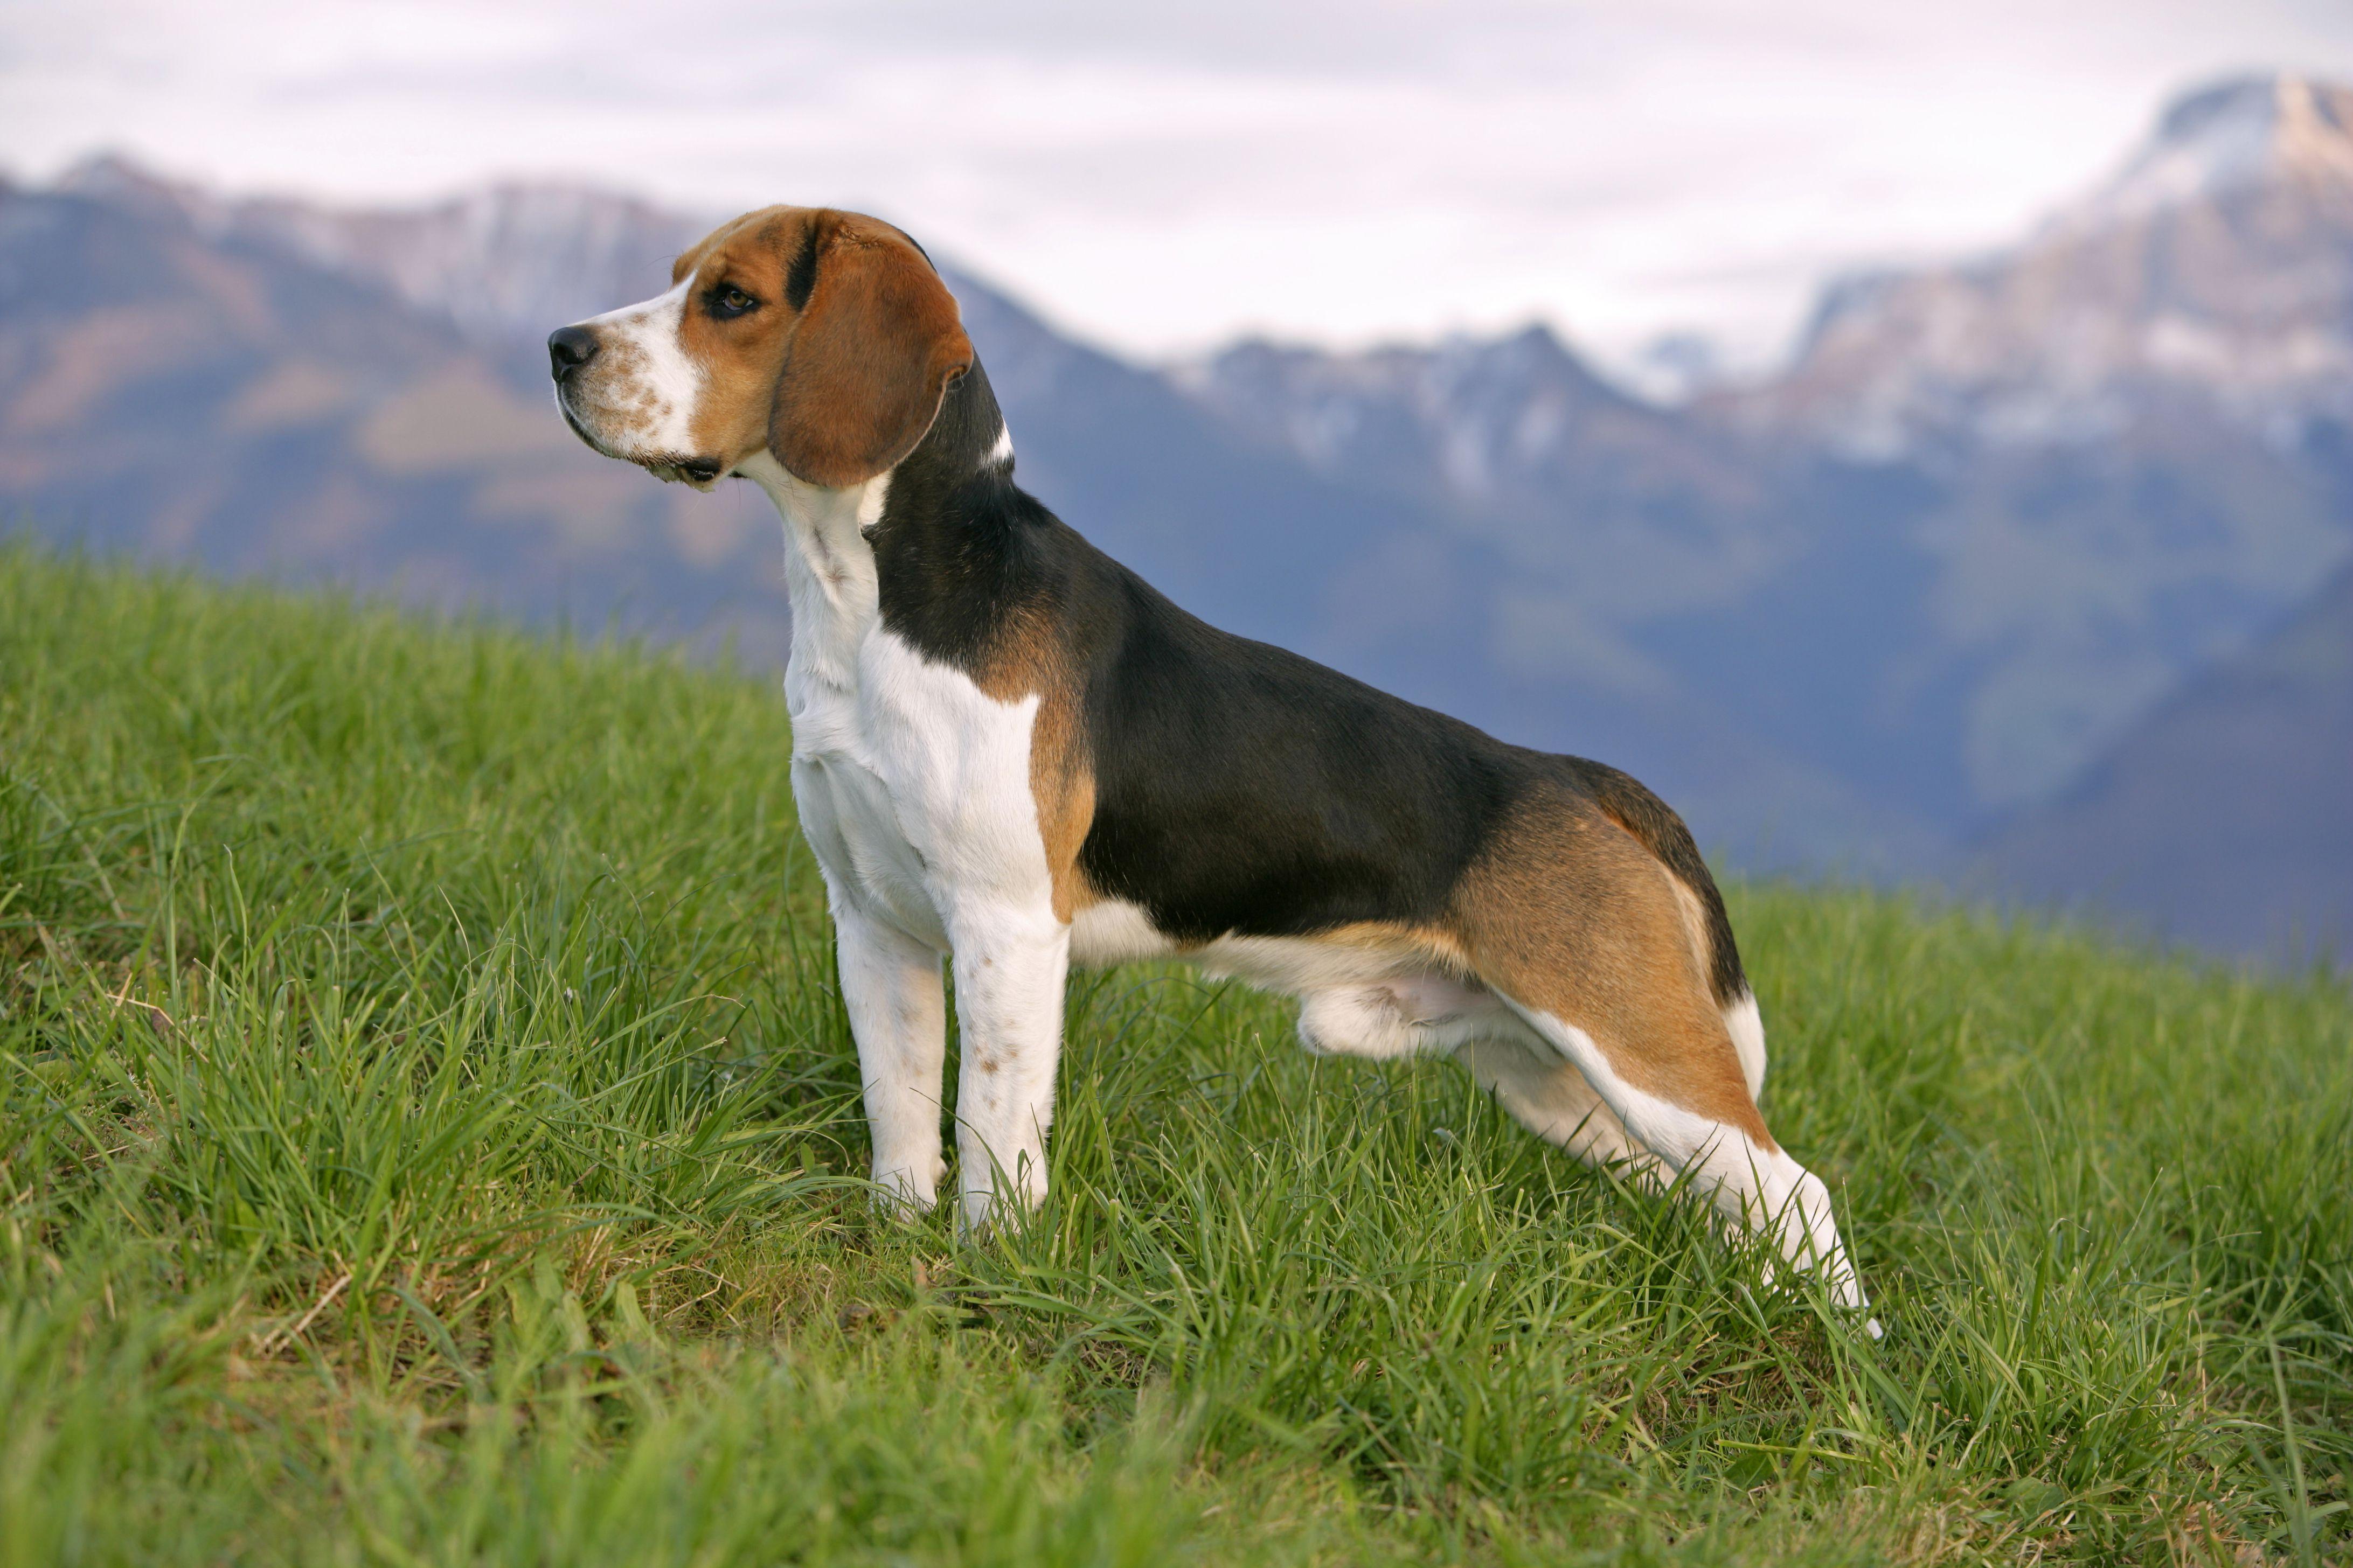 All About the Joyful Beagle